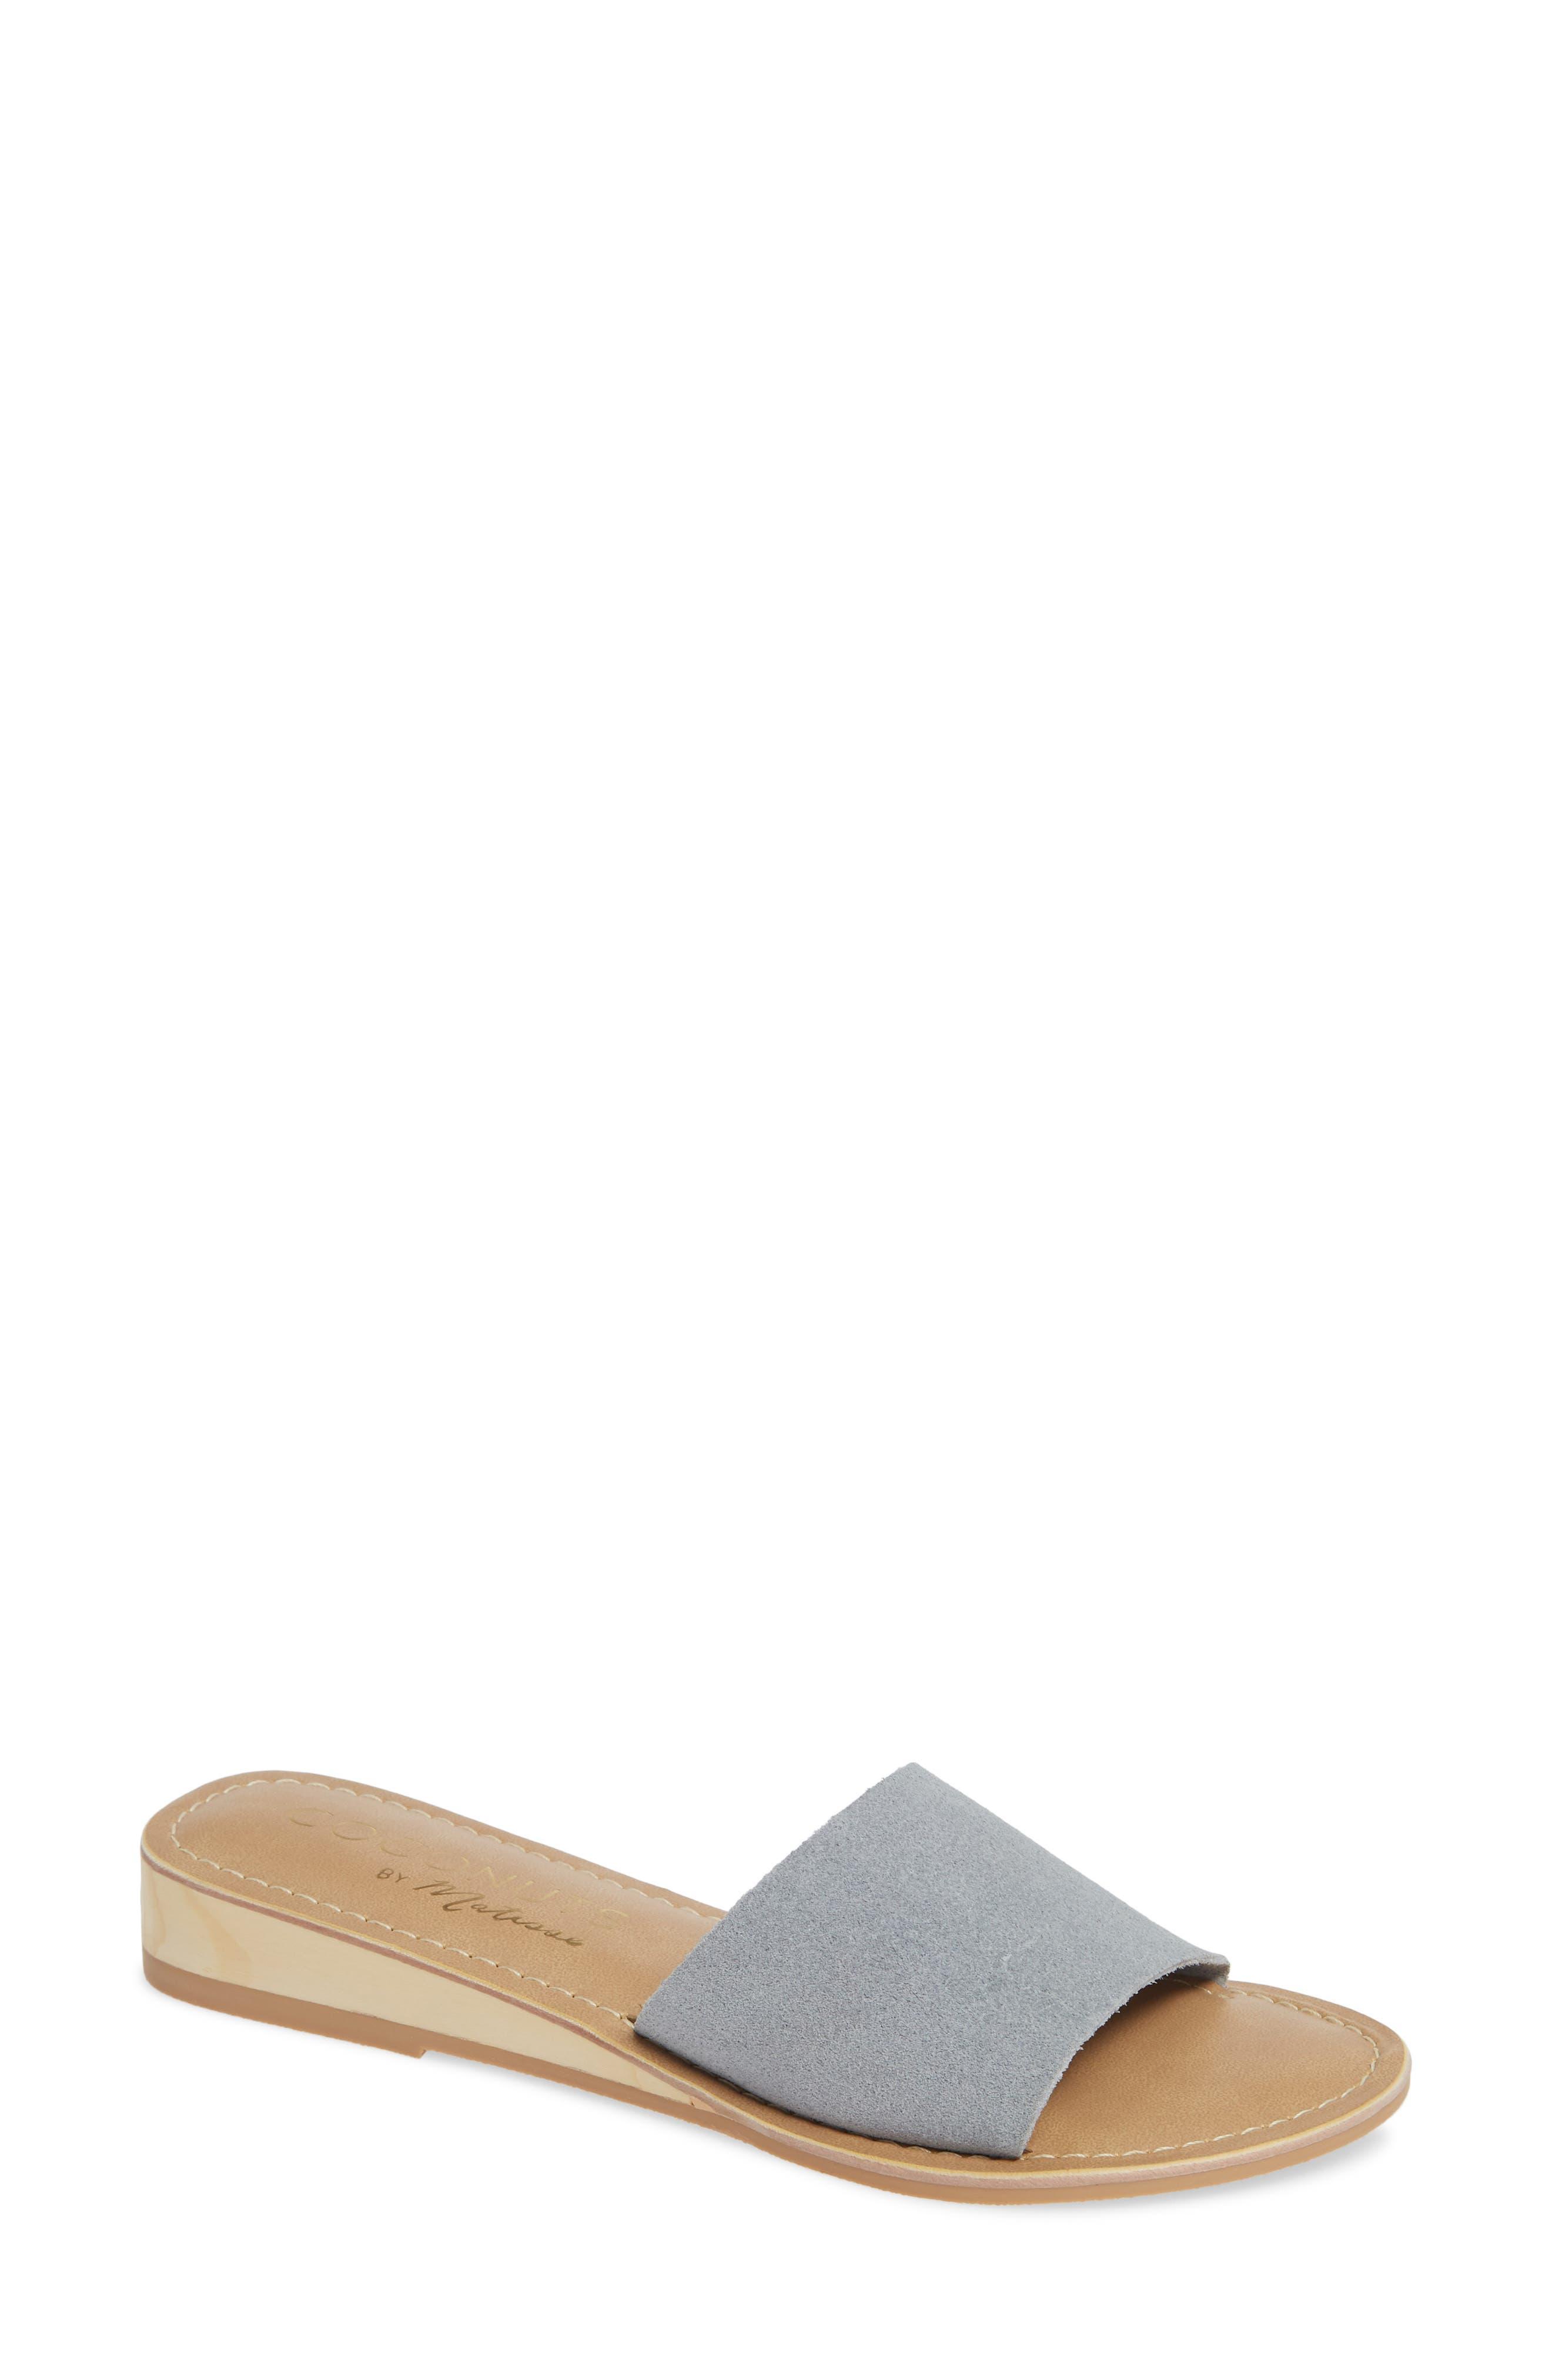 COCONUTS BY MATISSE Tiki Slide Sandal, Main, color, GREY SUEDE